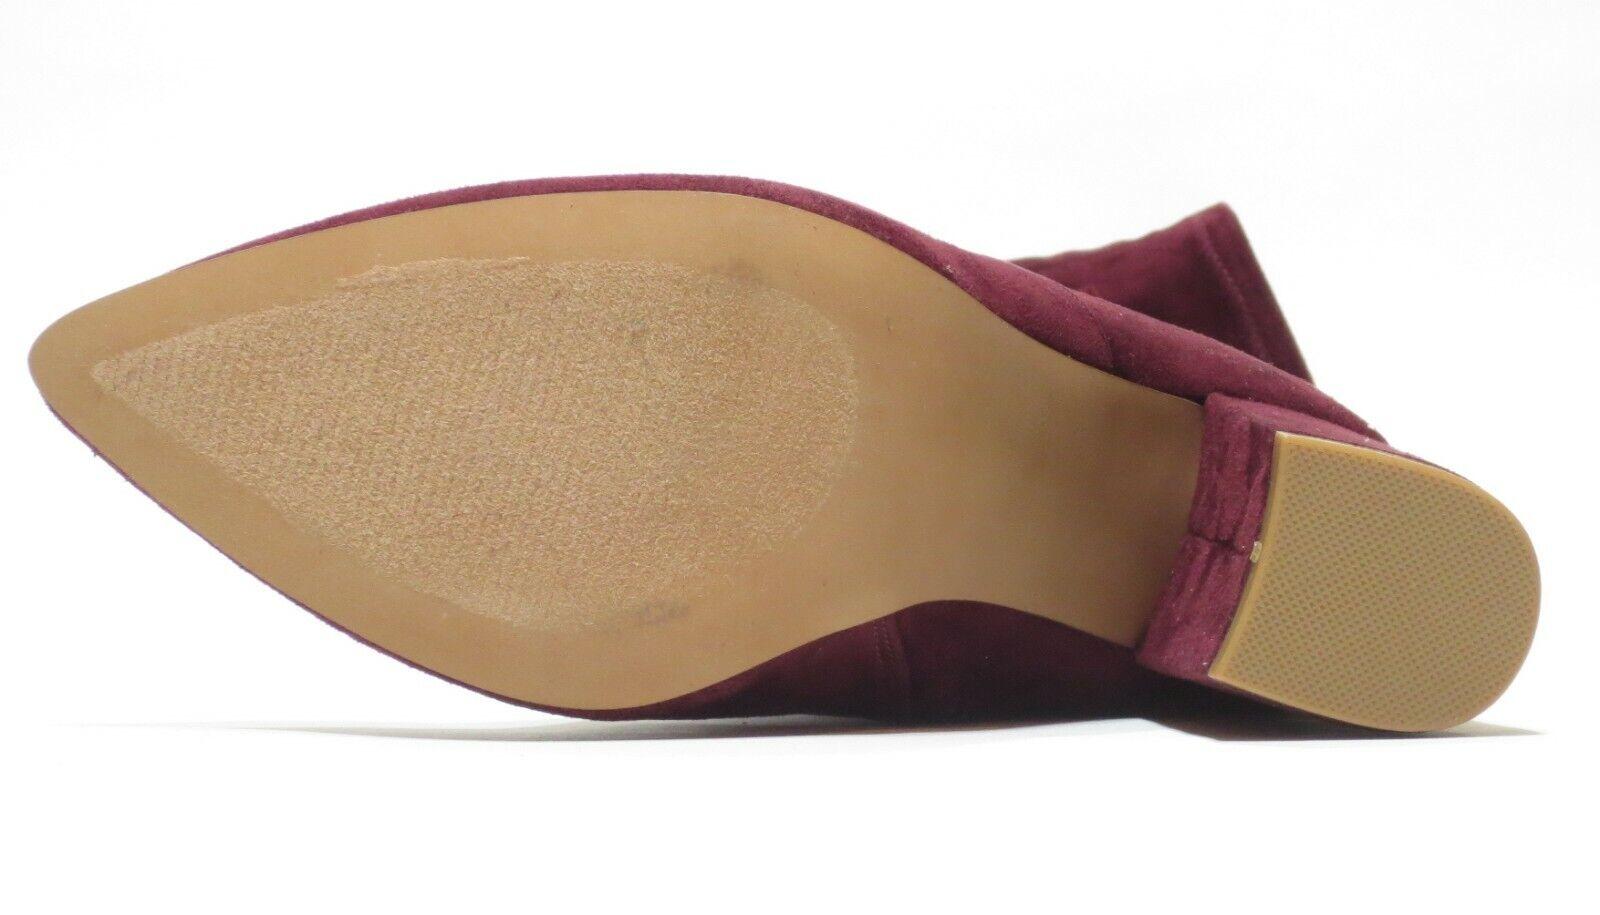 Steve Madden Madden Madden Rational Over the Knee Thigh High Heel Boots Tan   Burgundy   Black bce4f4